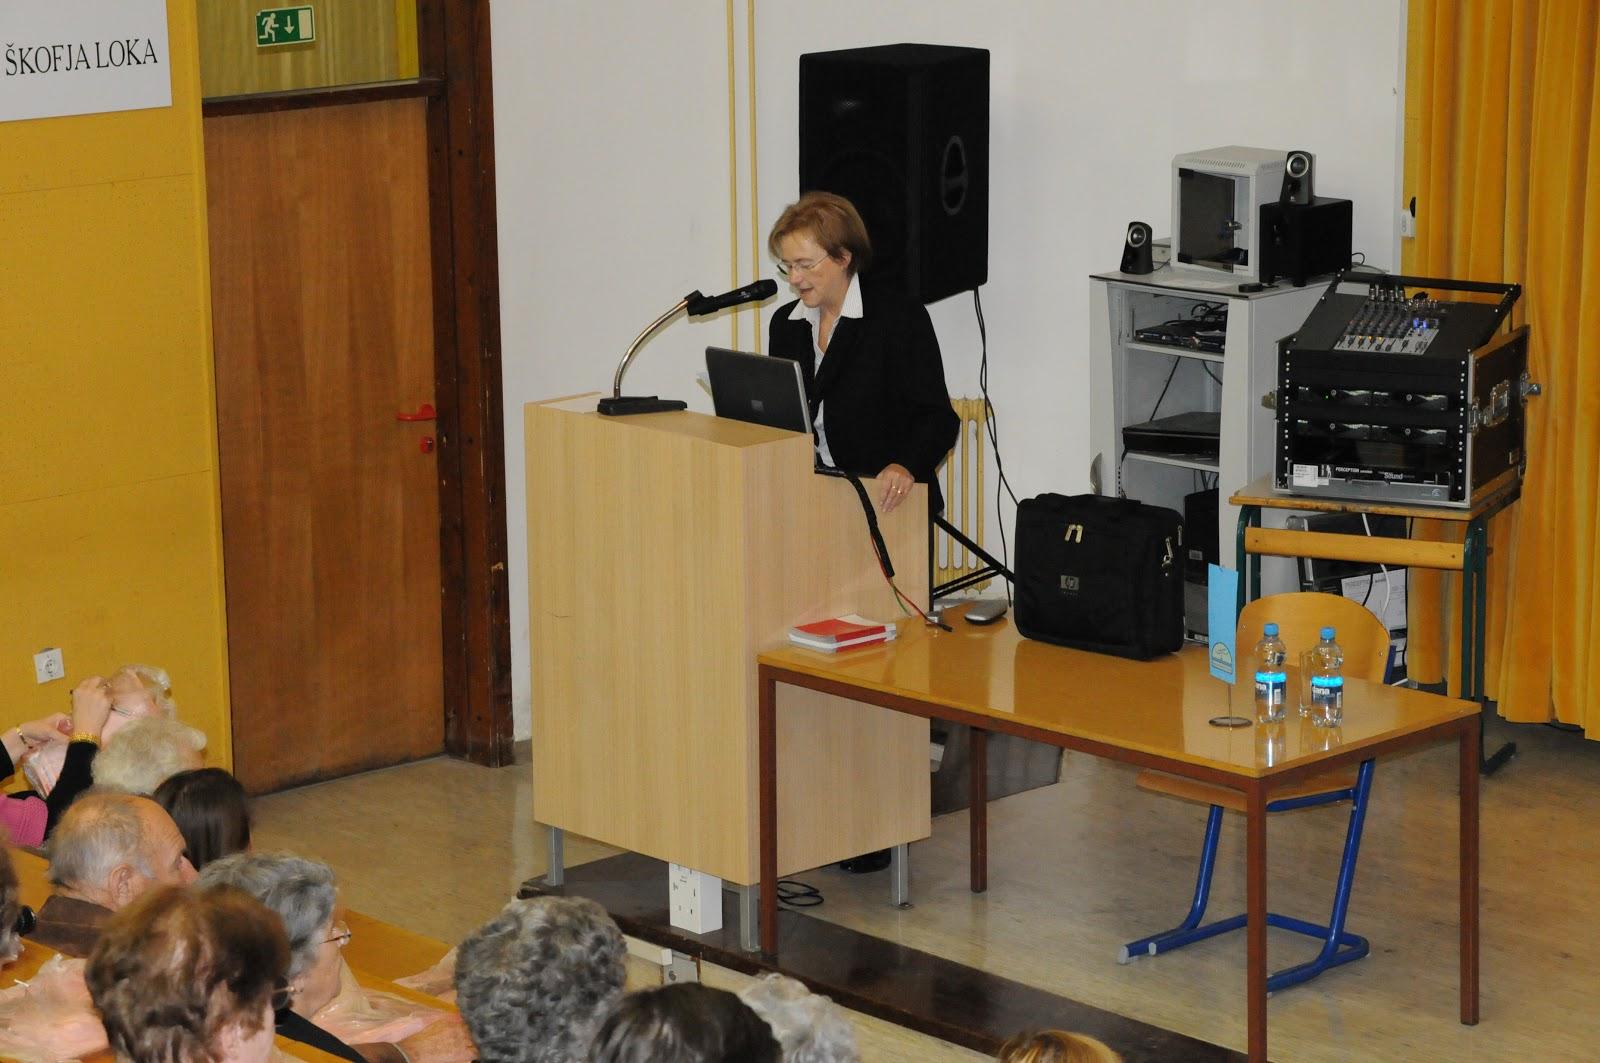 Predavanje, dr. Camlek - oktober 2011 - DSC_3861.JPG